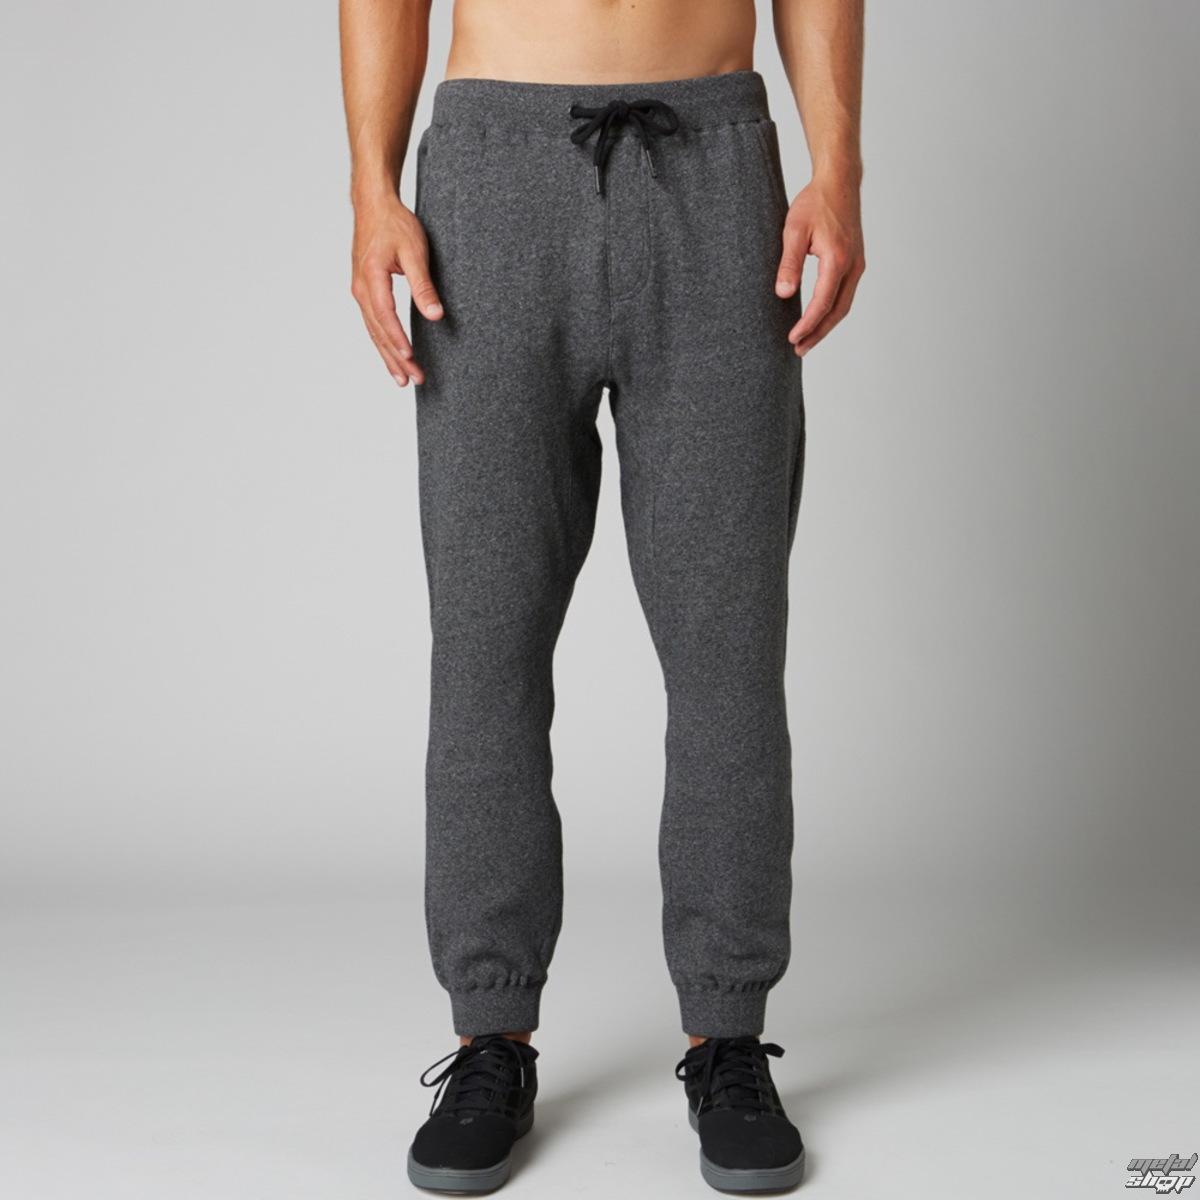 kalhoty (tepláky) pánské FOX - Hondo - Heather Black - 15S-13529-243